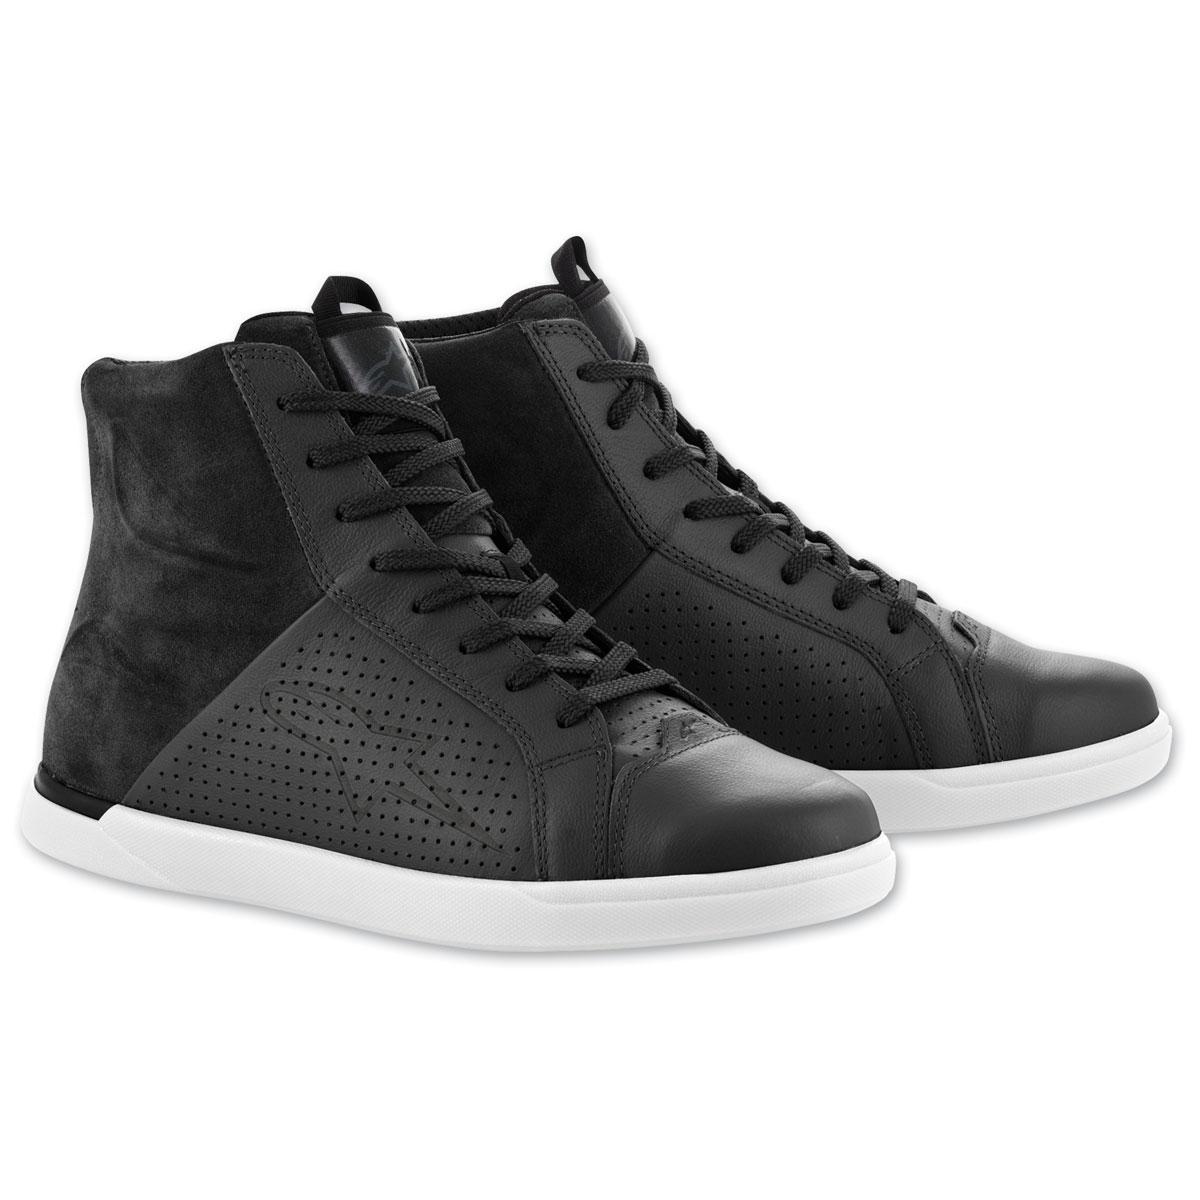 Alpinestars Men's Jam Air Black/Black Shoes